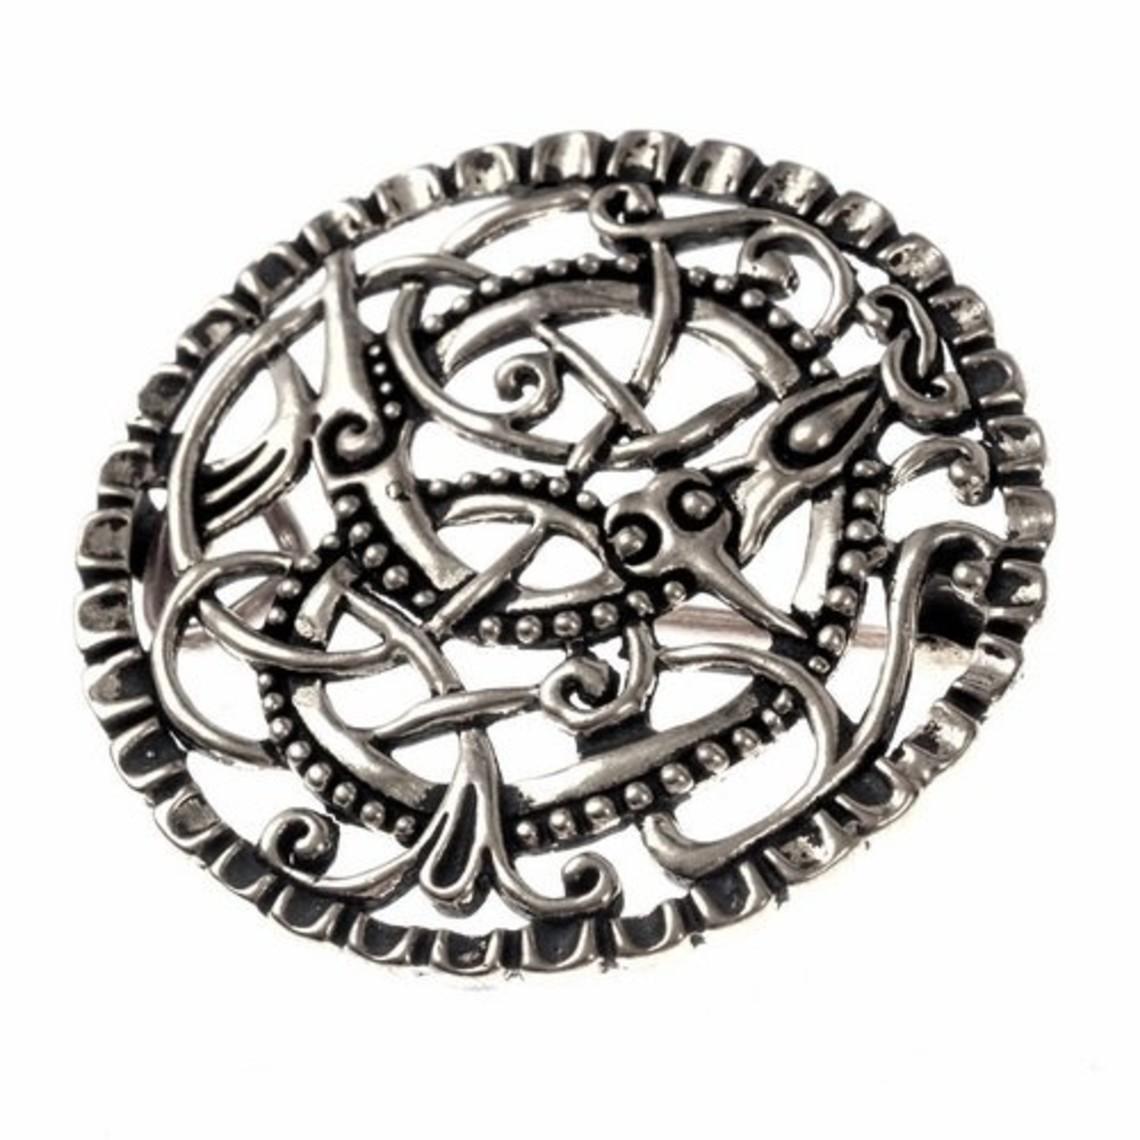 Pitney Brosche, Bronze versilbert